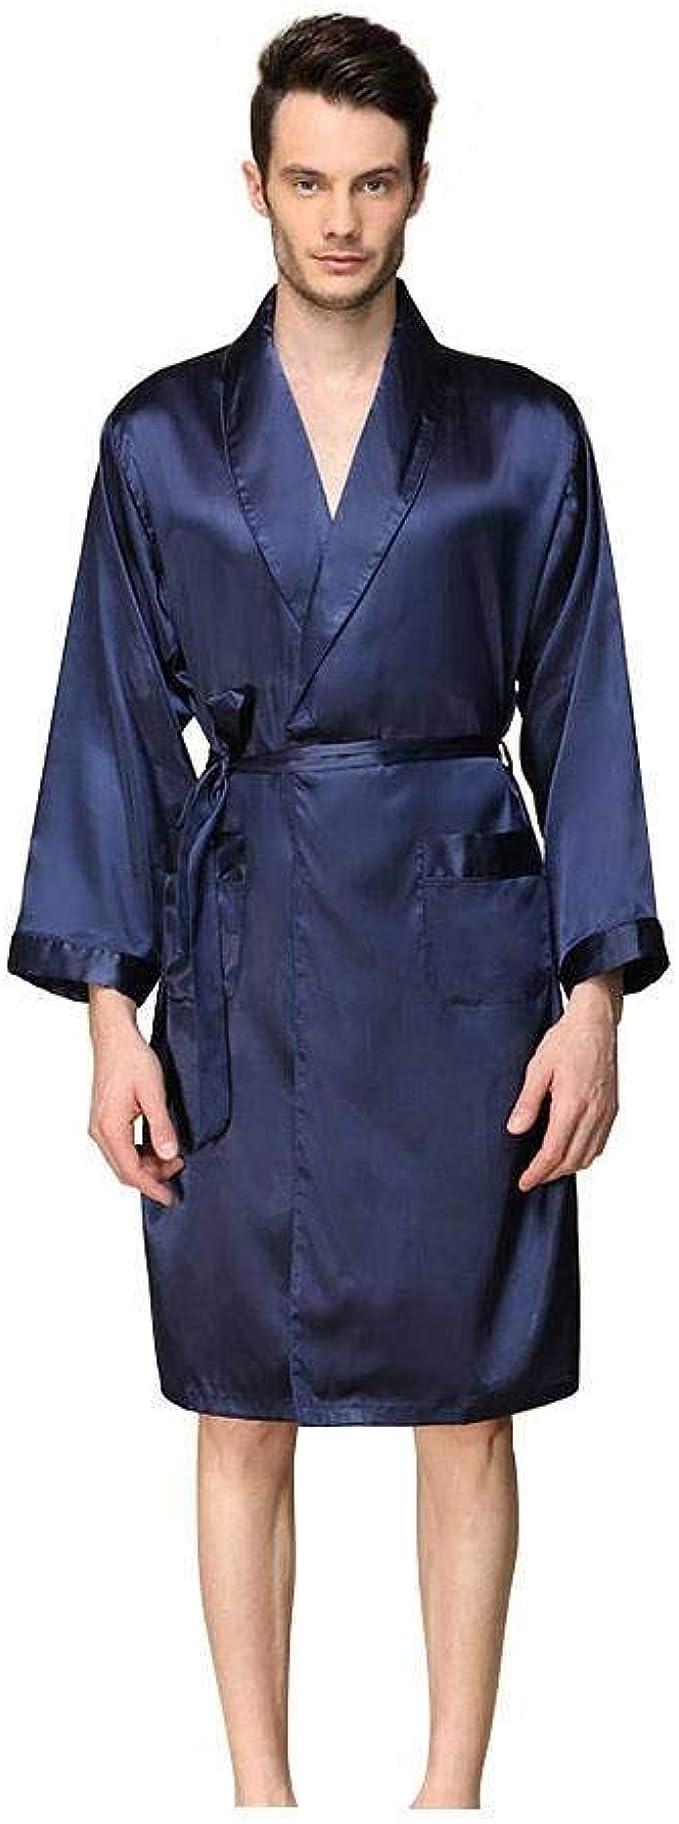 Herren Satin Seide Kimono Bademantel Robe Locker Nachtwäsche Hausanzug